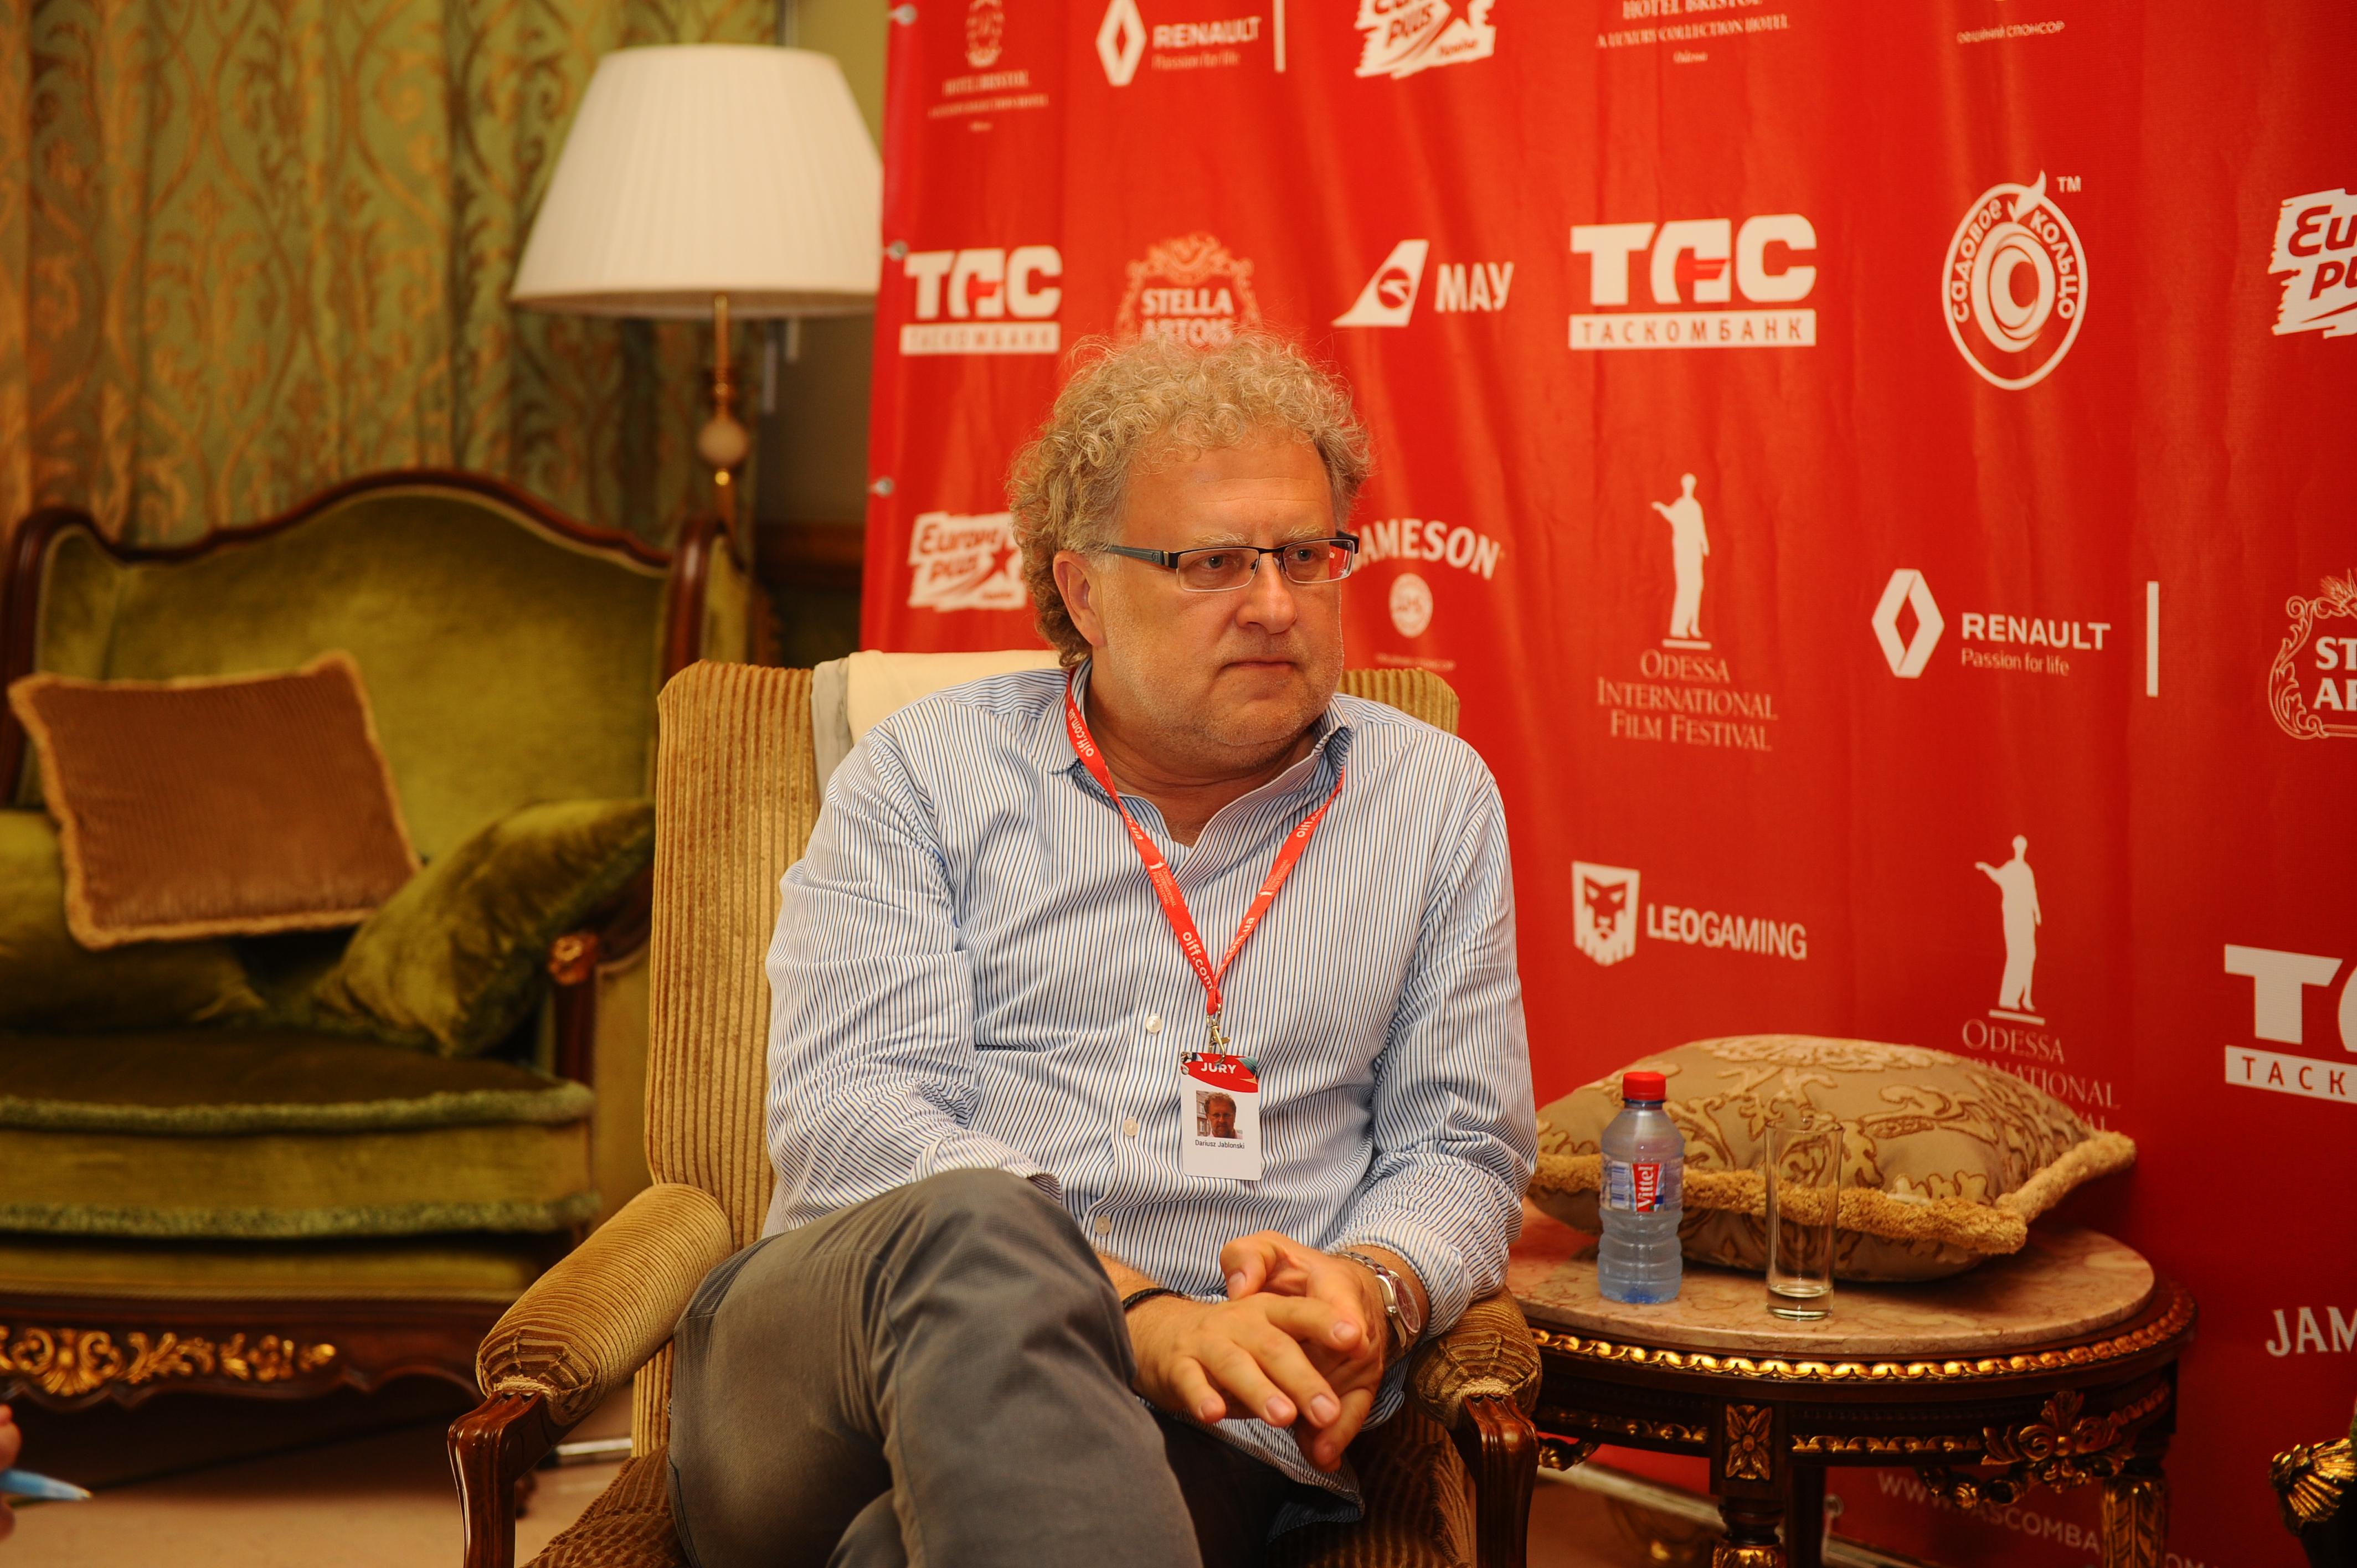 Одесский кинофестиваль: Дариуш Яблонски